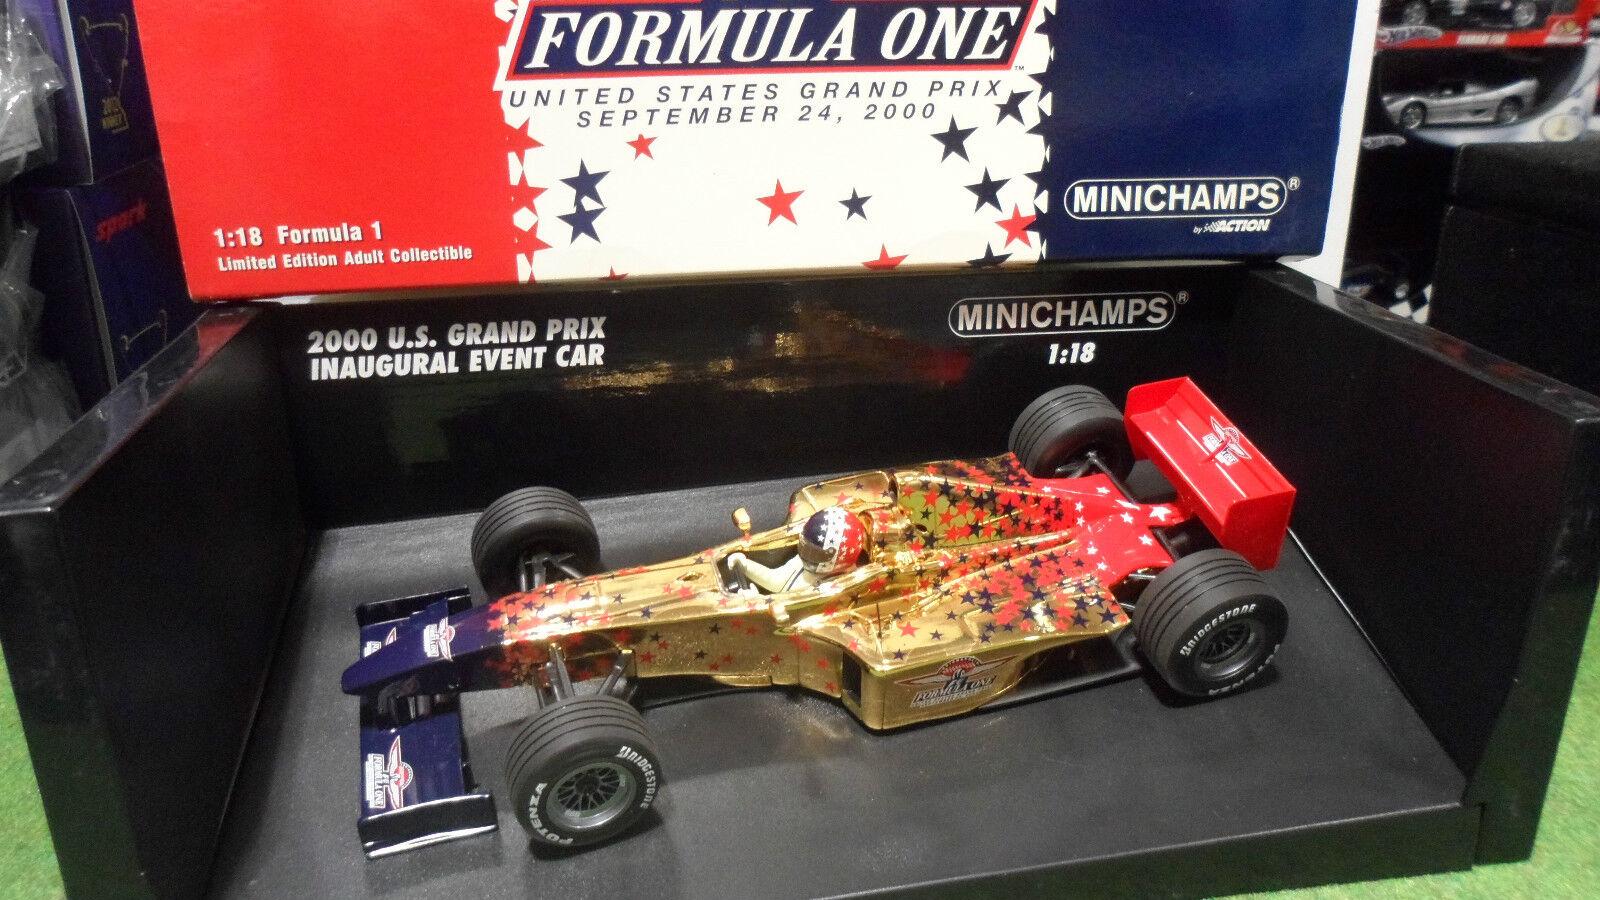 F1 FORMULA 1 INDIANAPOLIS US GRAND PRIX EVENT CAR INAUGURAL au 1 18 Minichamps